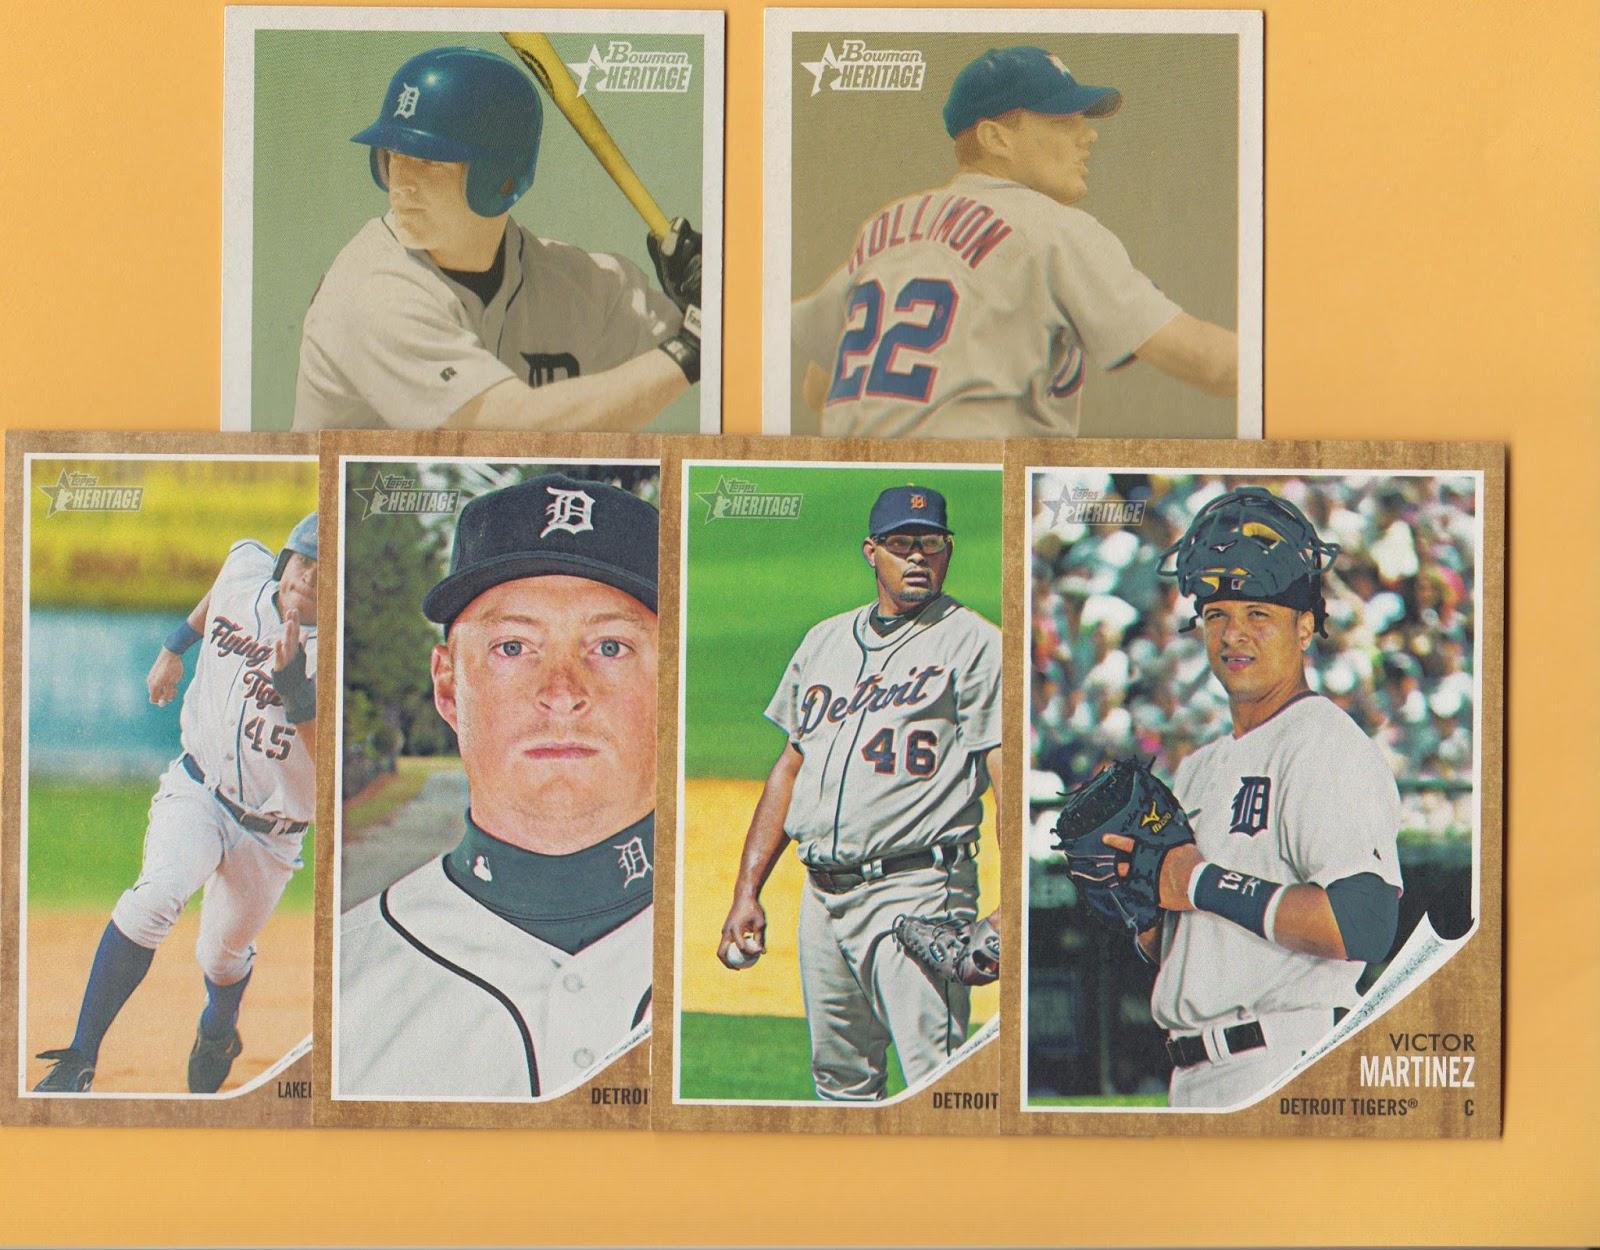 A Cracked Bat Baseball Cards And A Hot Dog Bo Knows